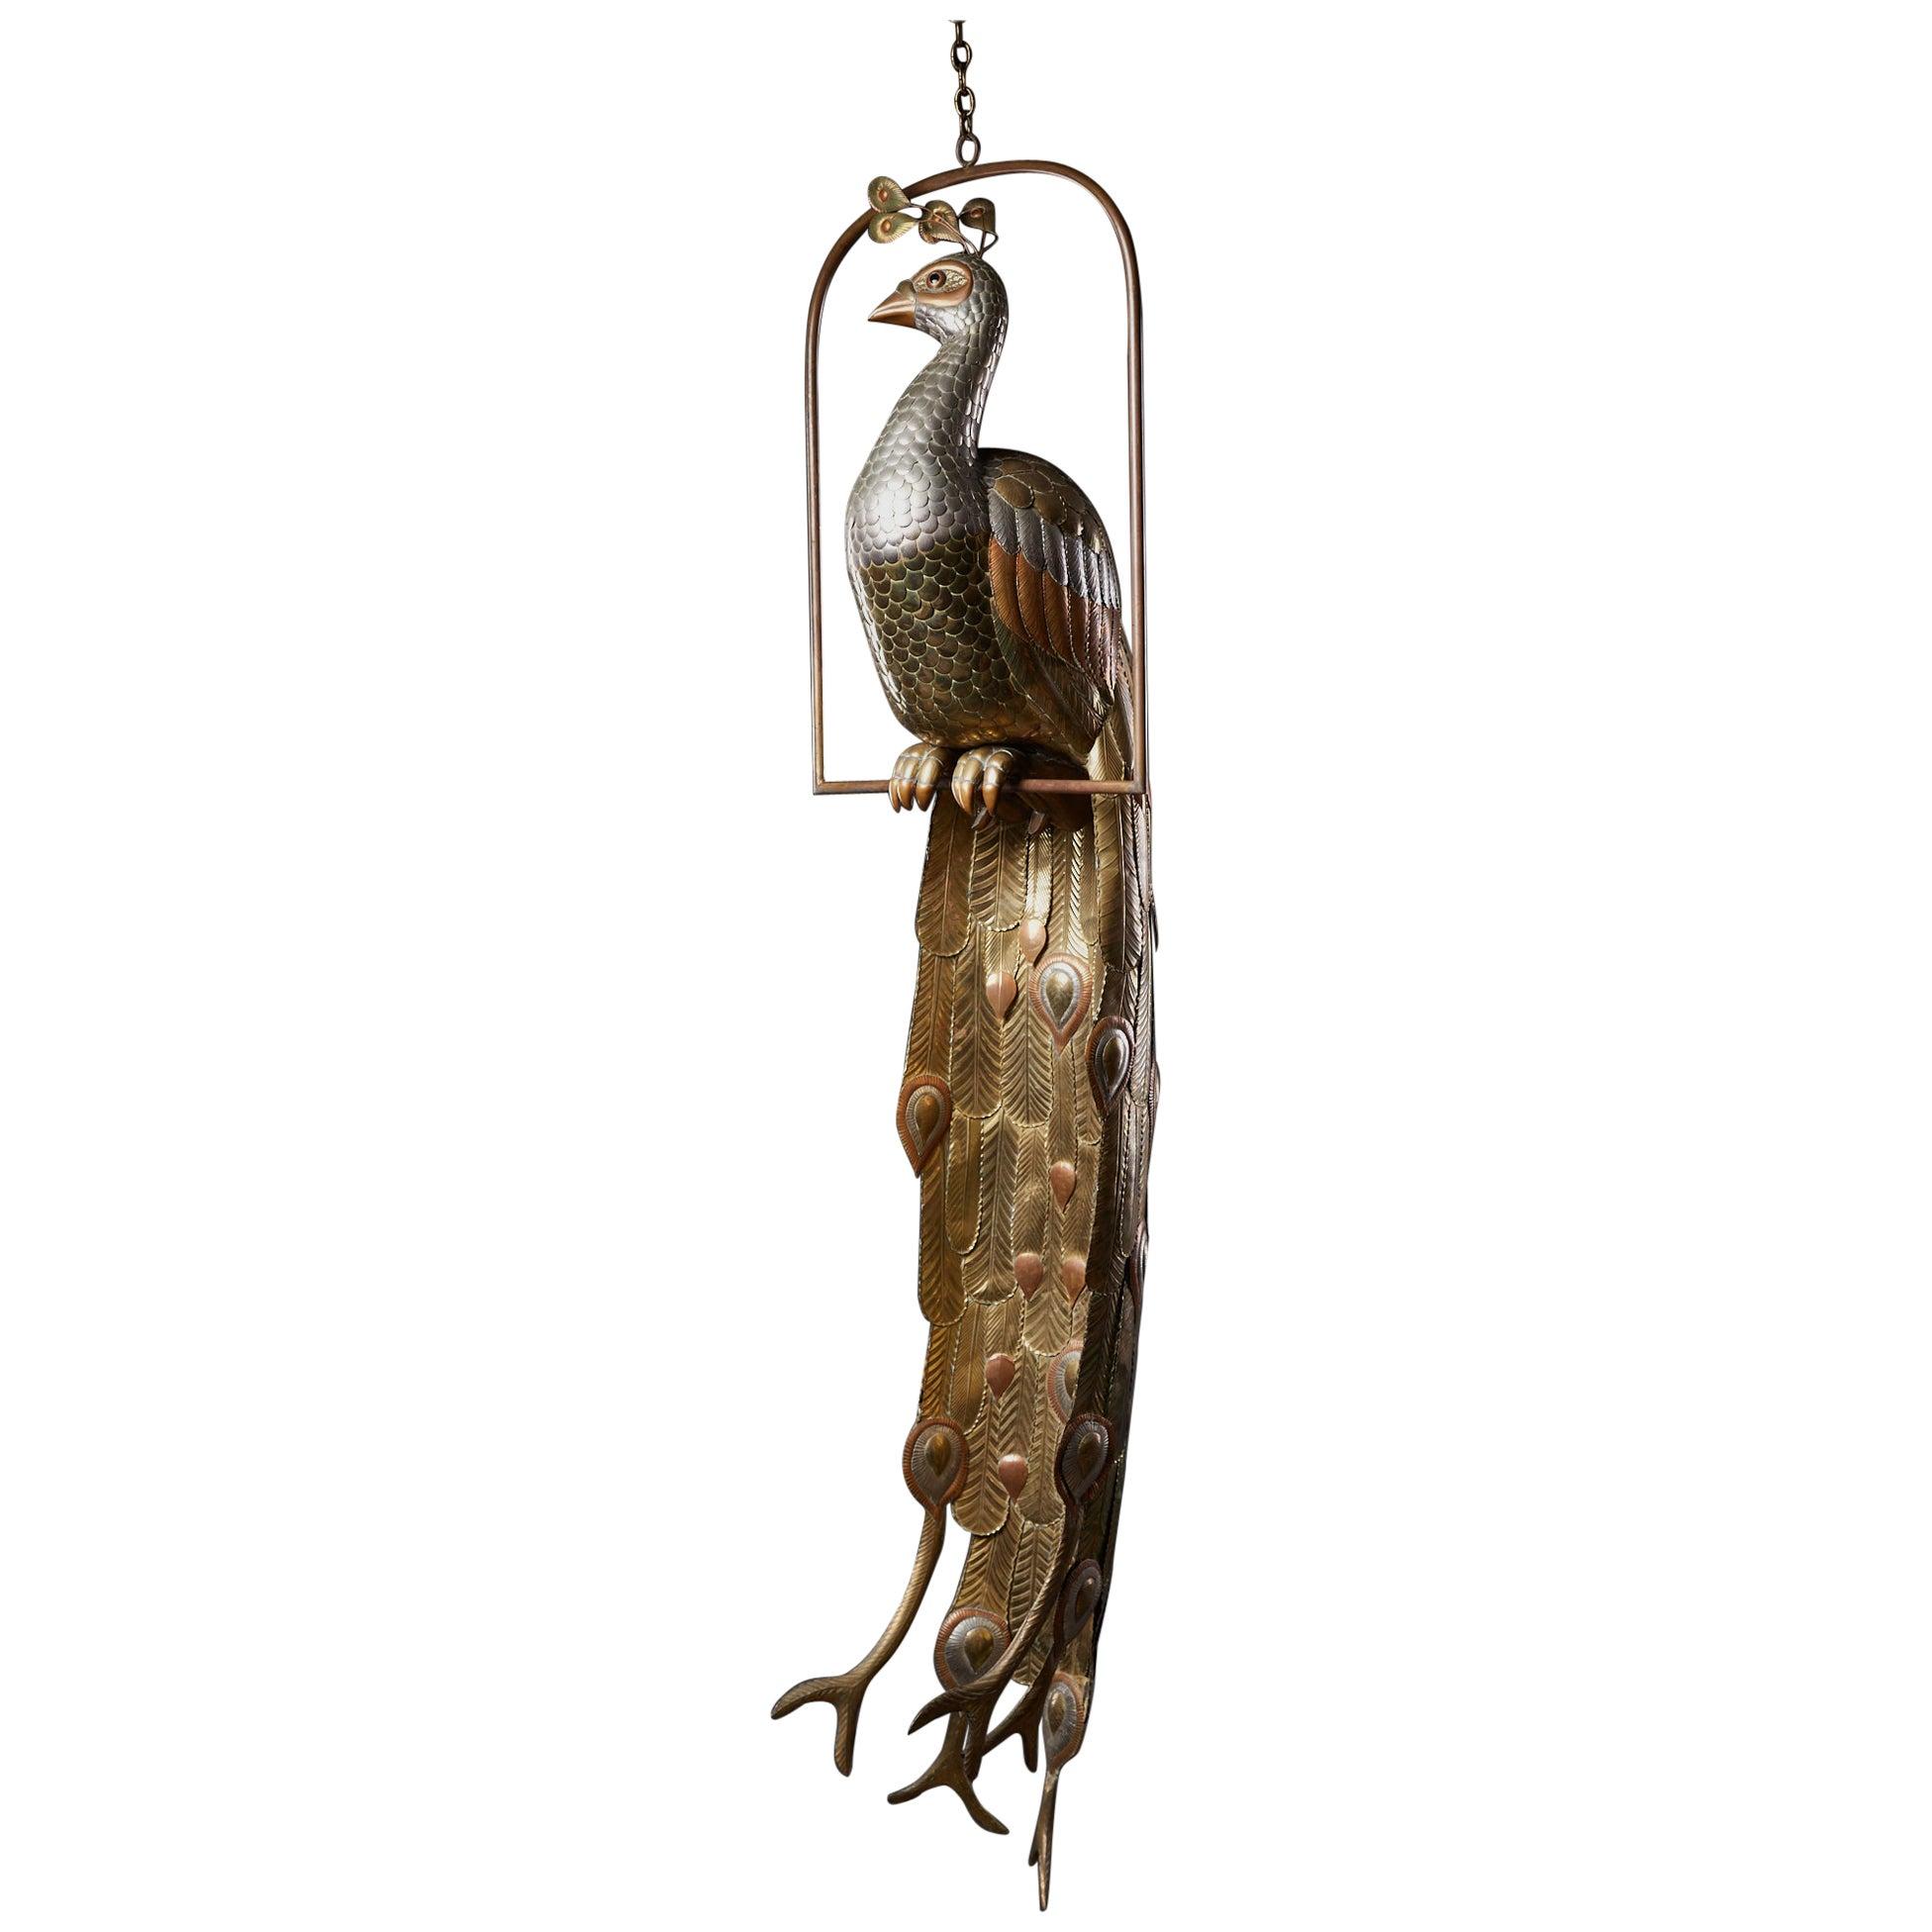 Brass Peacock Sculpture by Sergio Bustamante